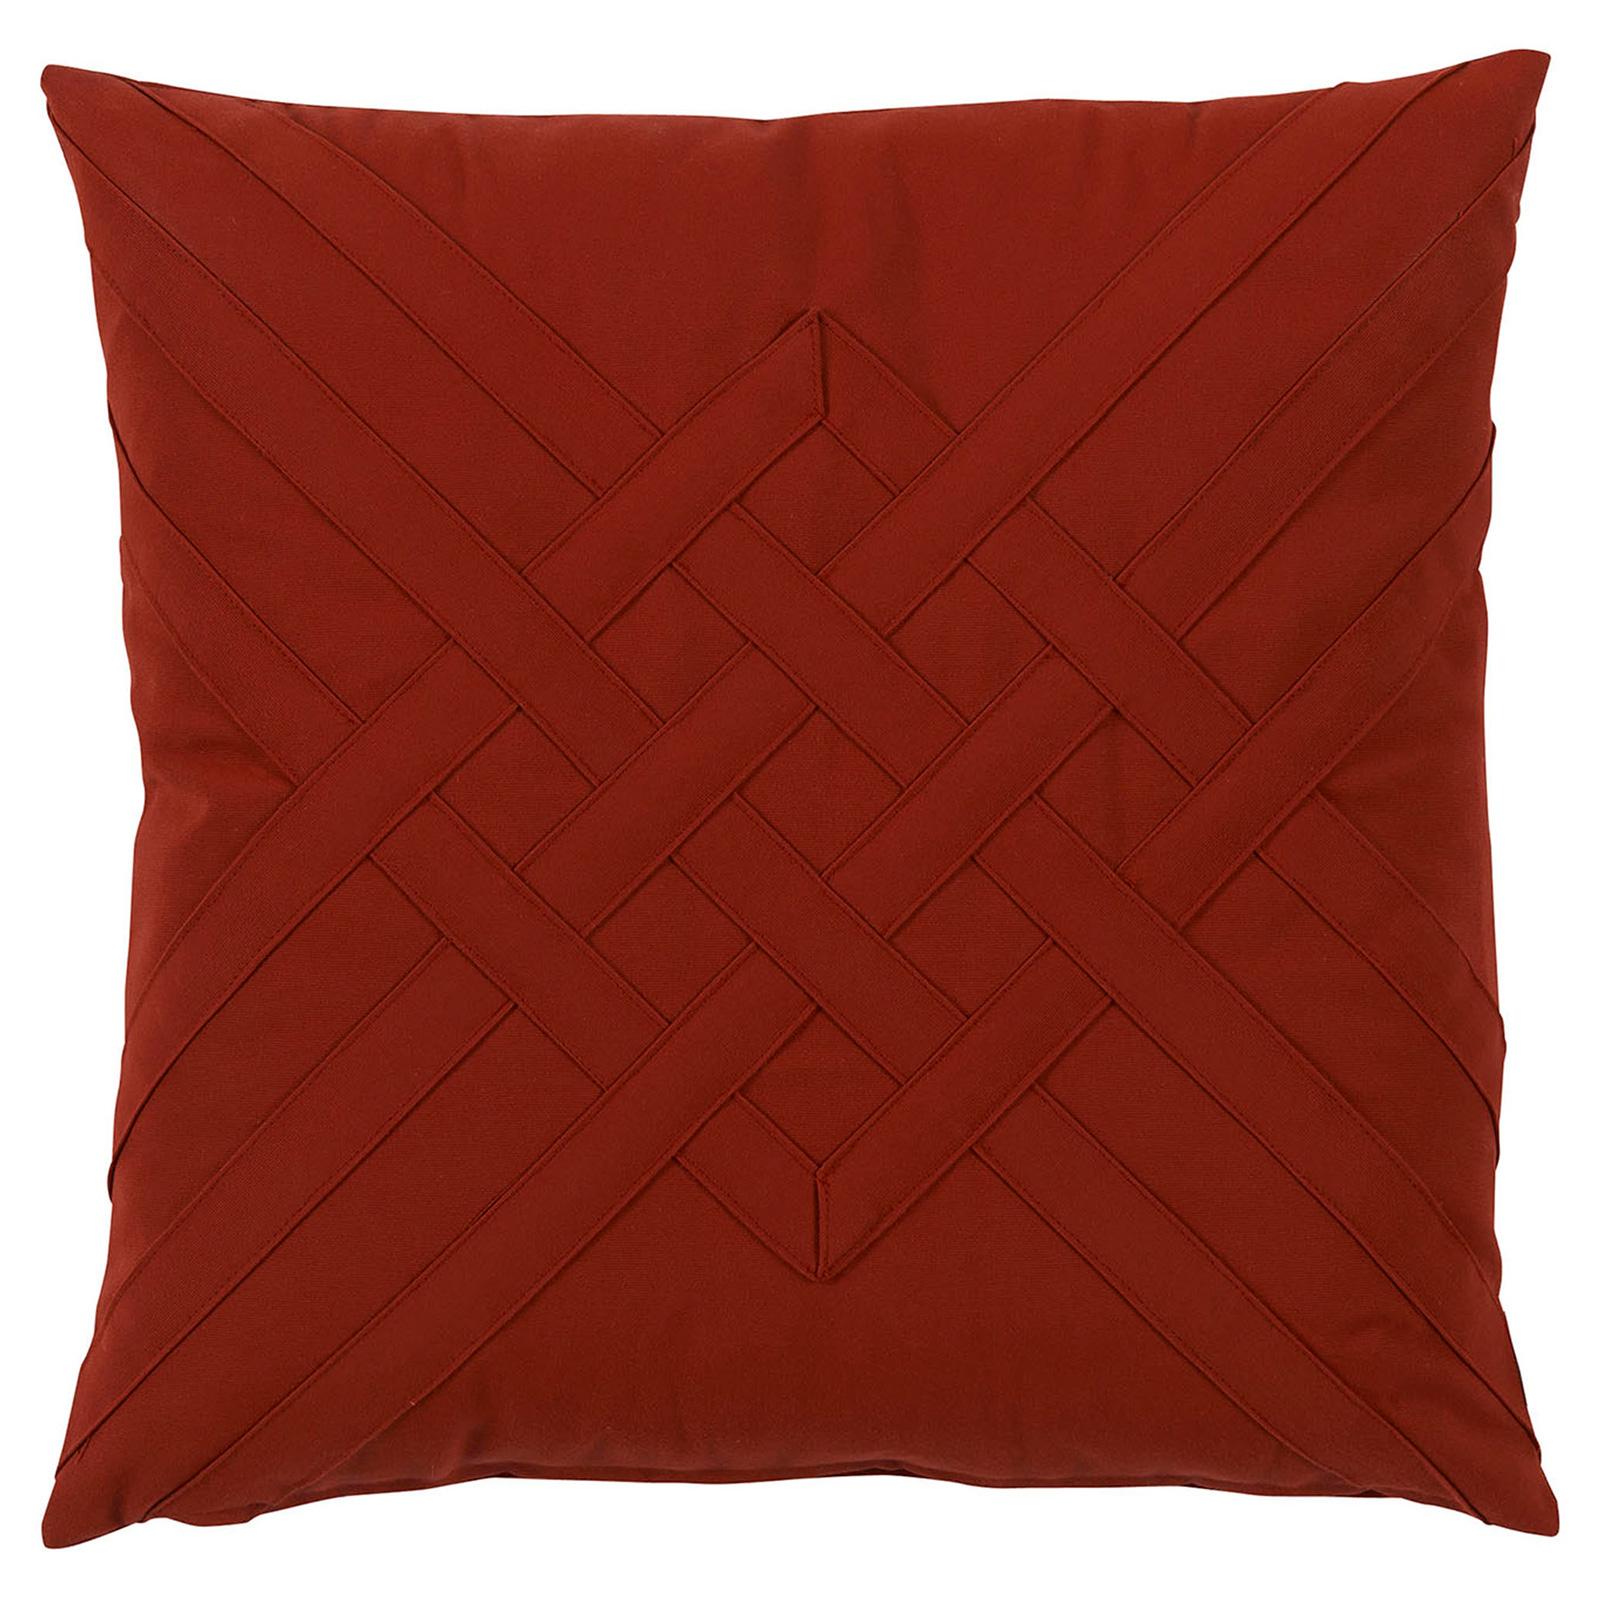 Will Modern Red Lattice Weave Outdoor Pillow - 20x20